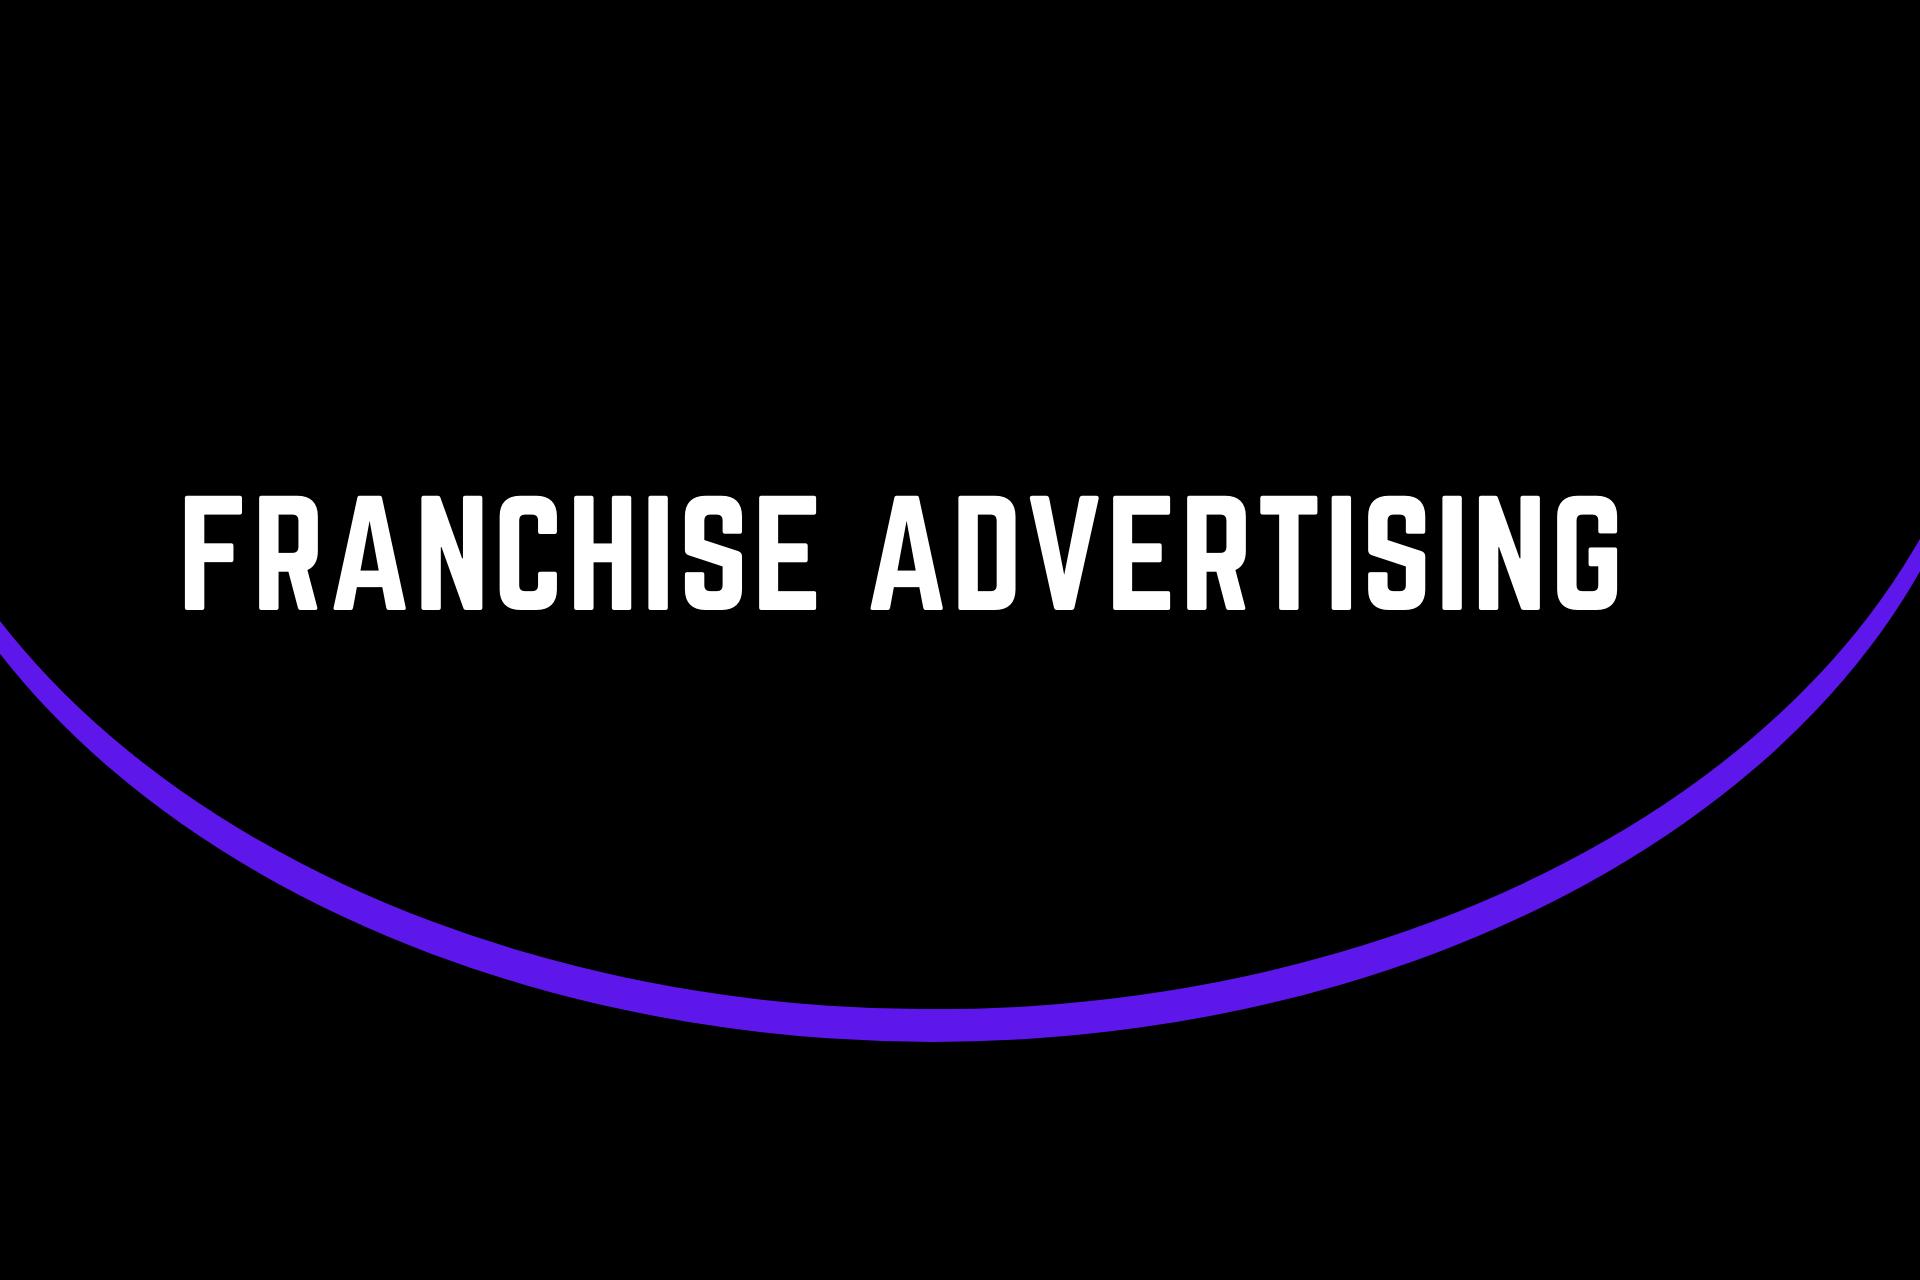 Franchise advertising